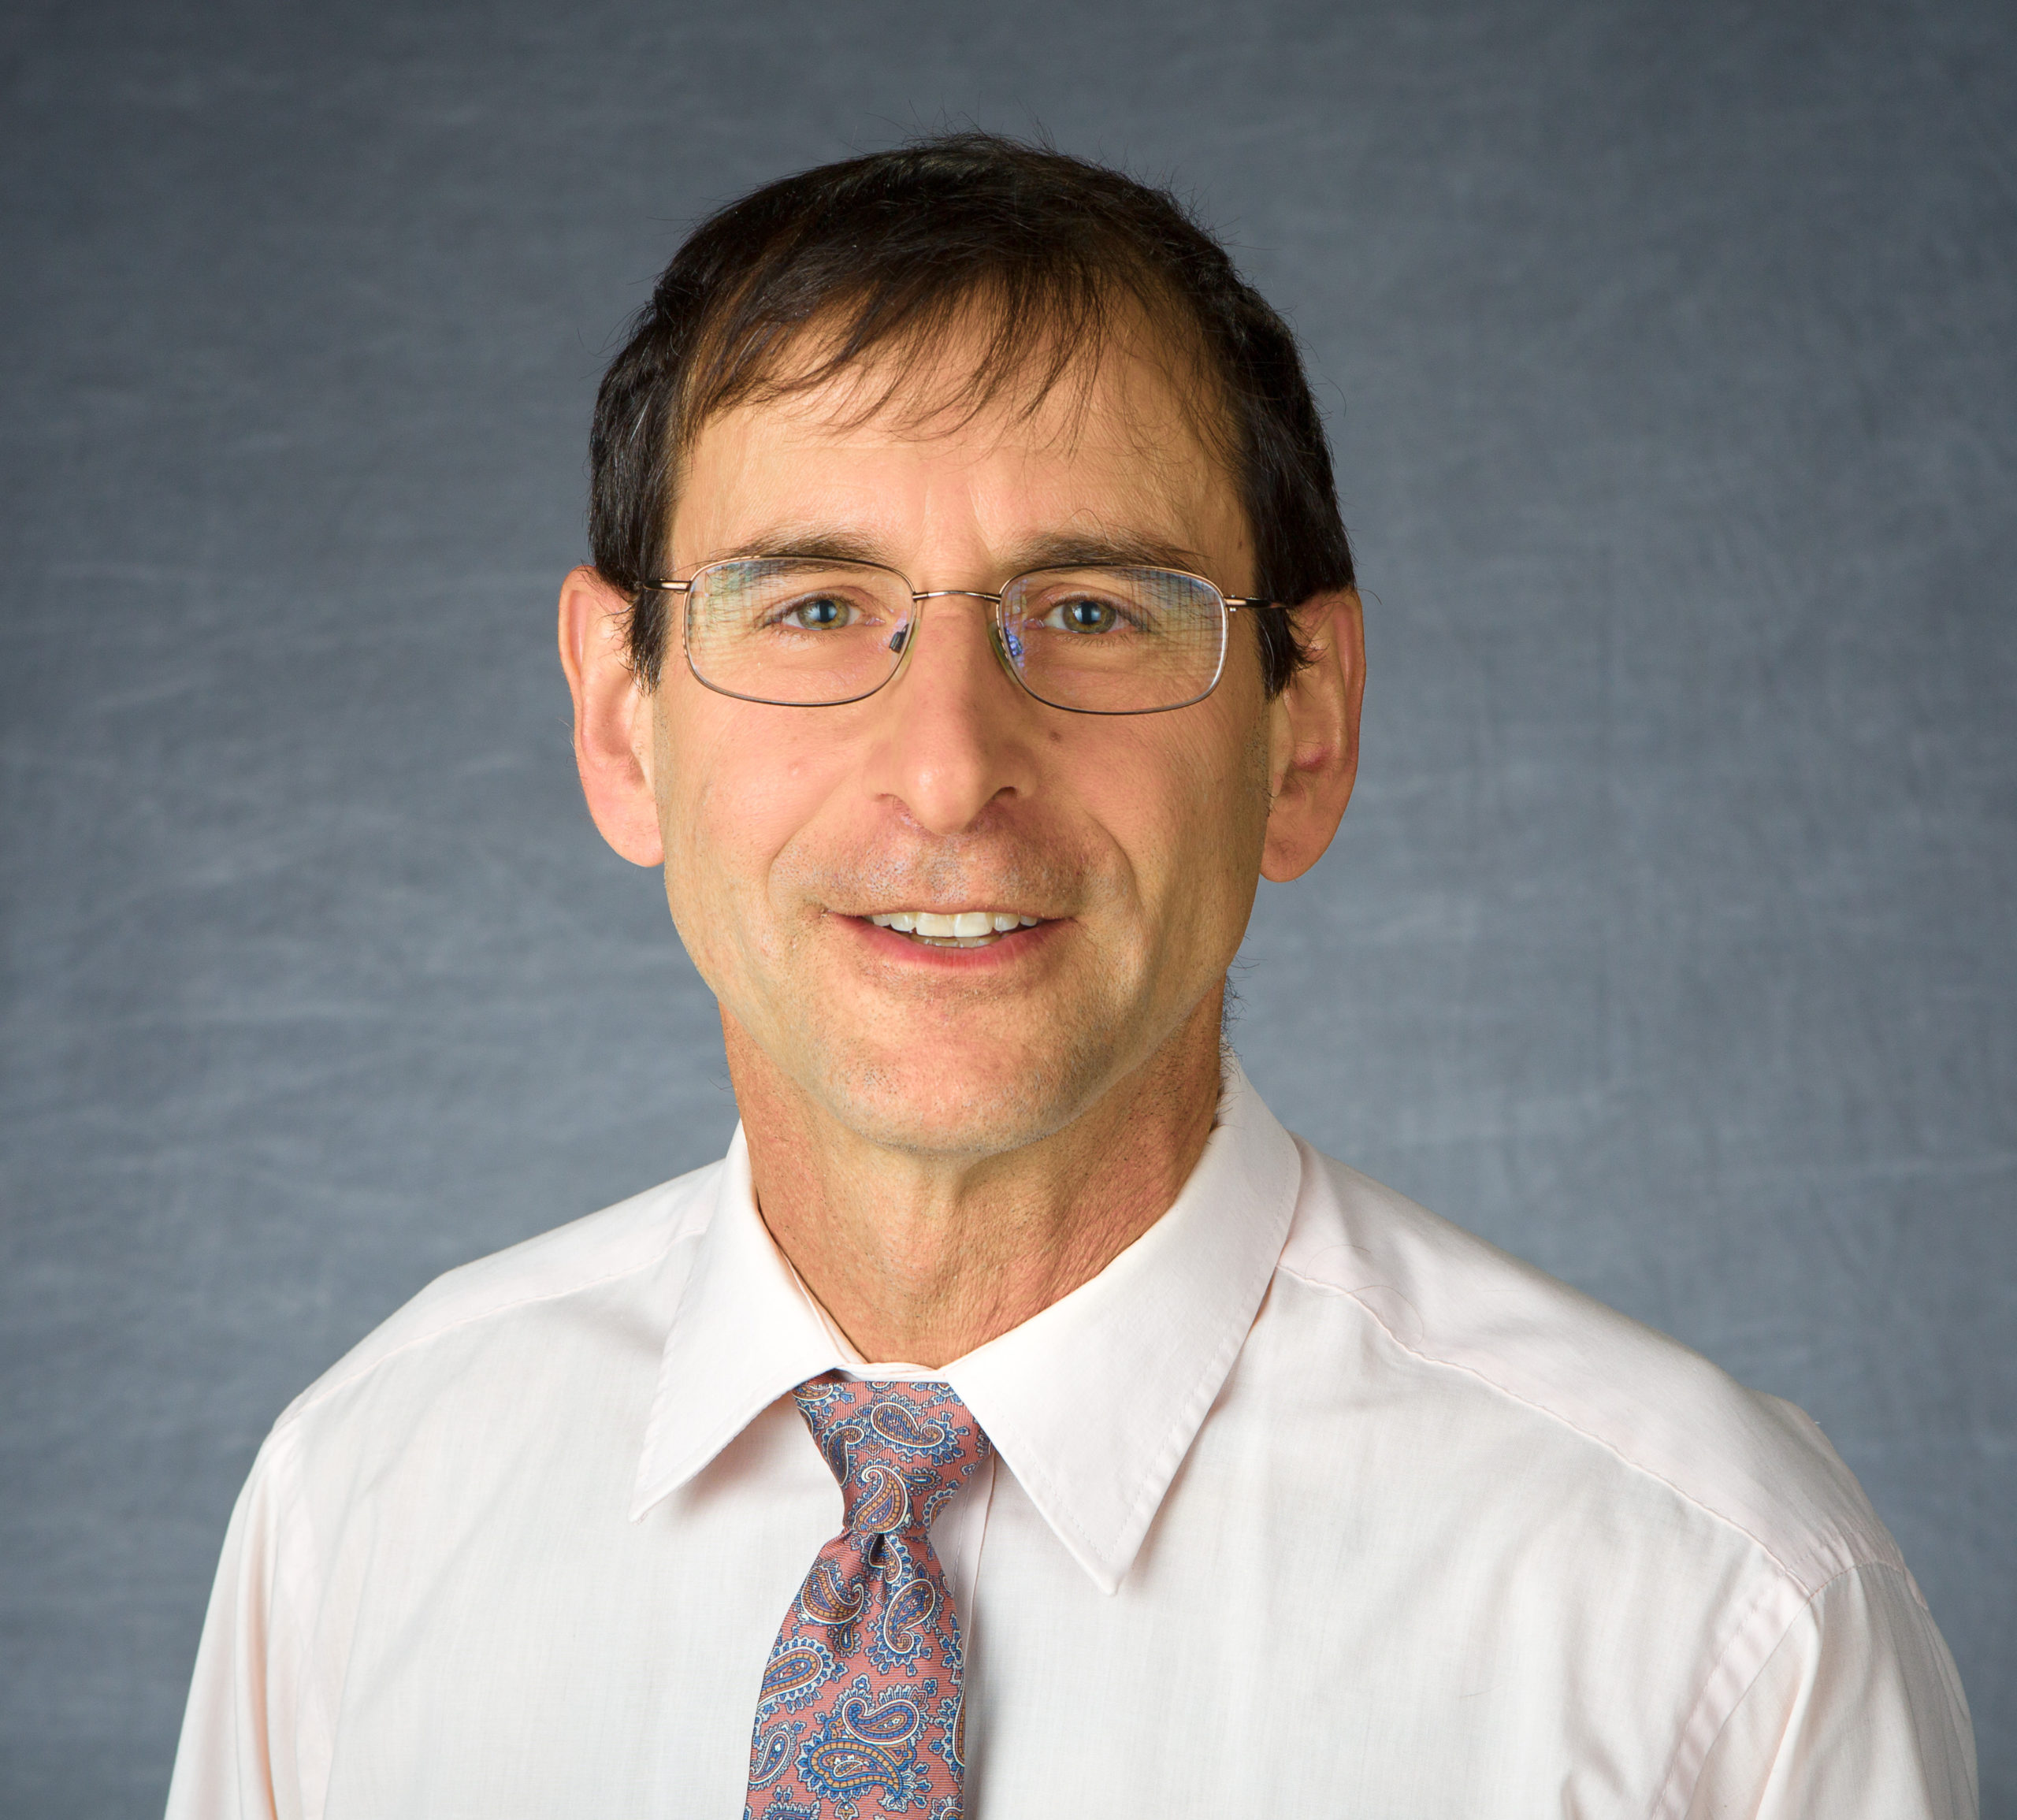 Paul Vincelli